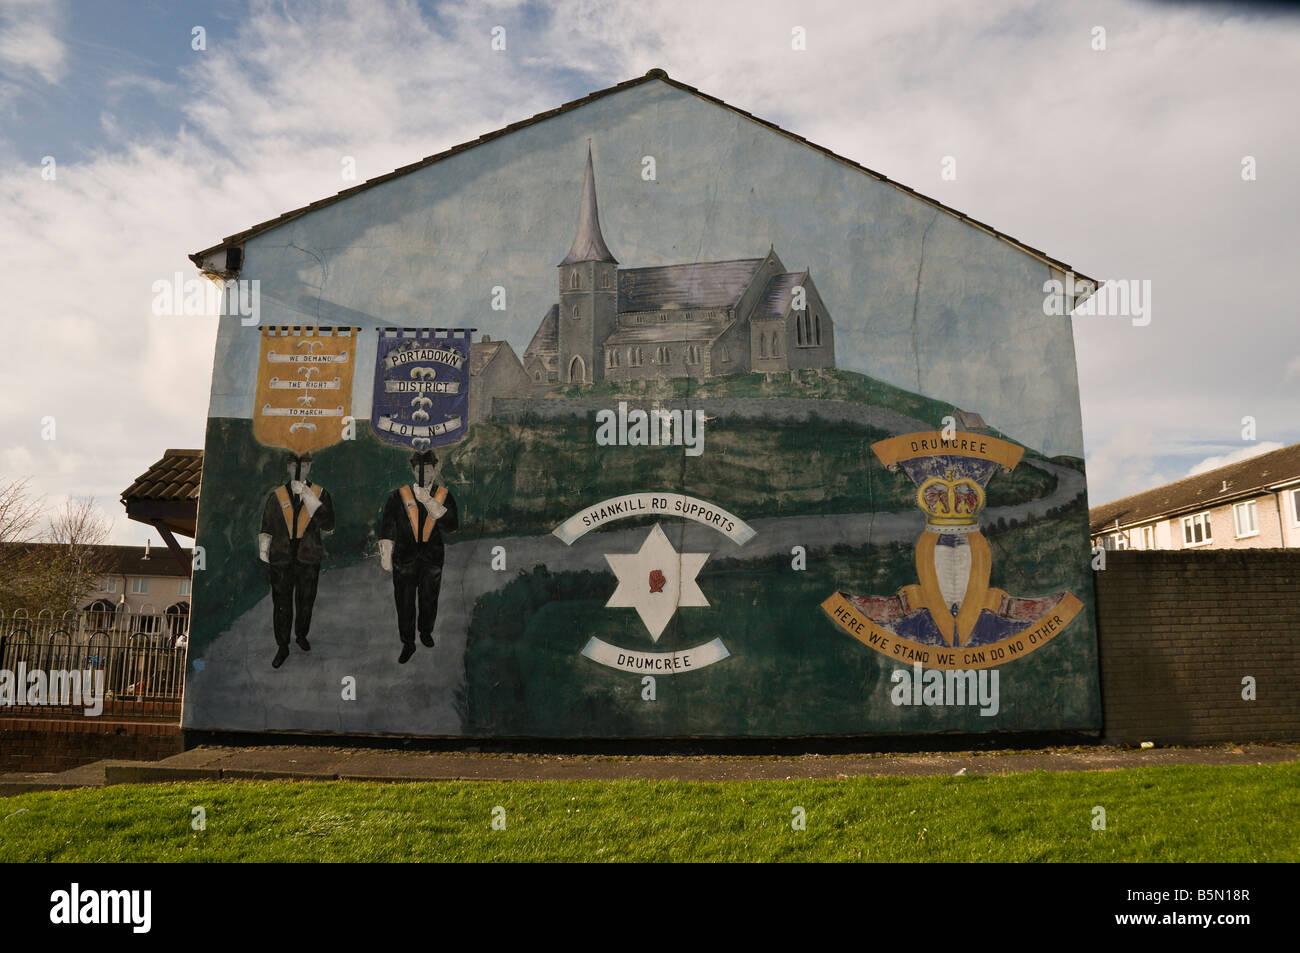 Loyalist/Unionist mural. 'Shankill Road supports Drumcree' - Stock Image